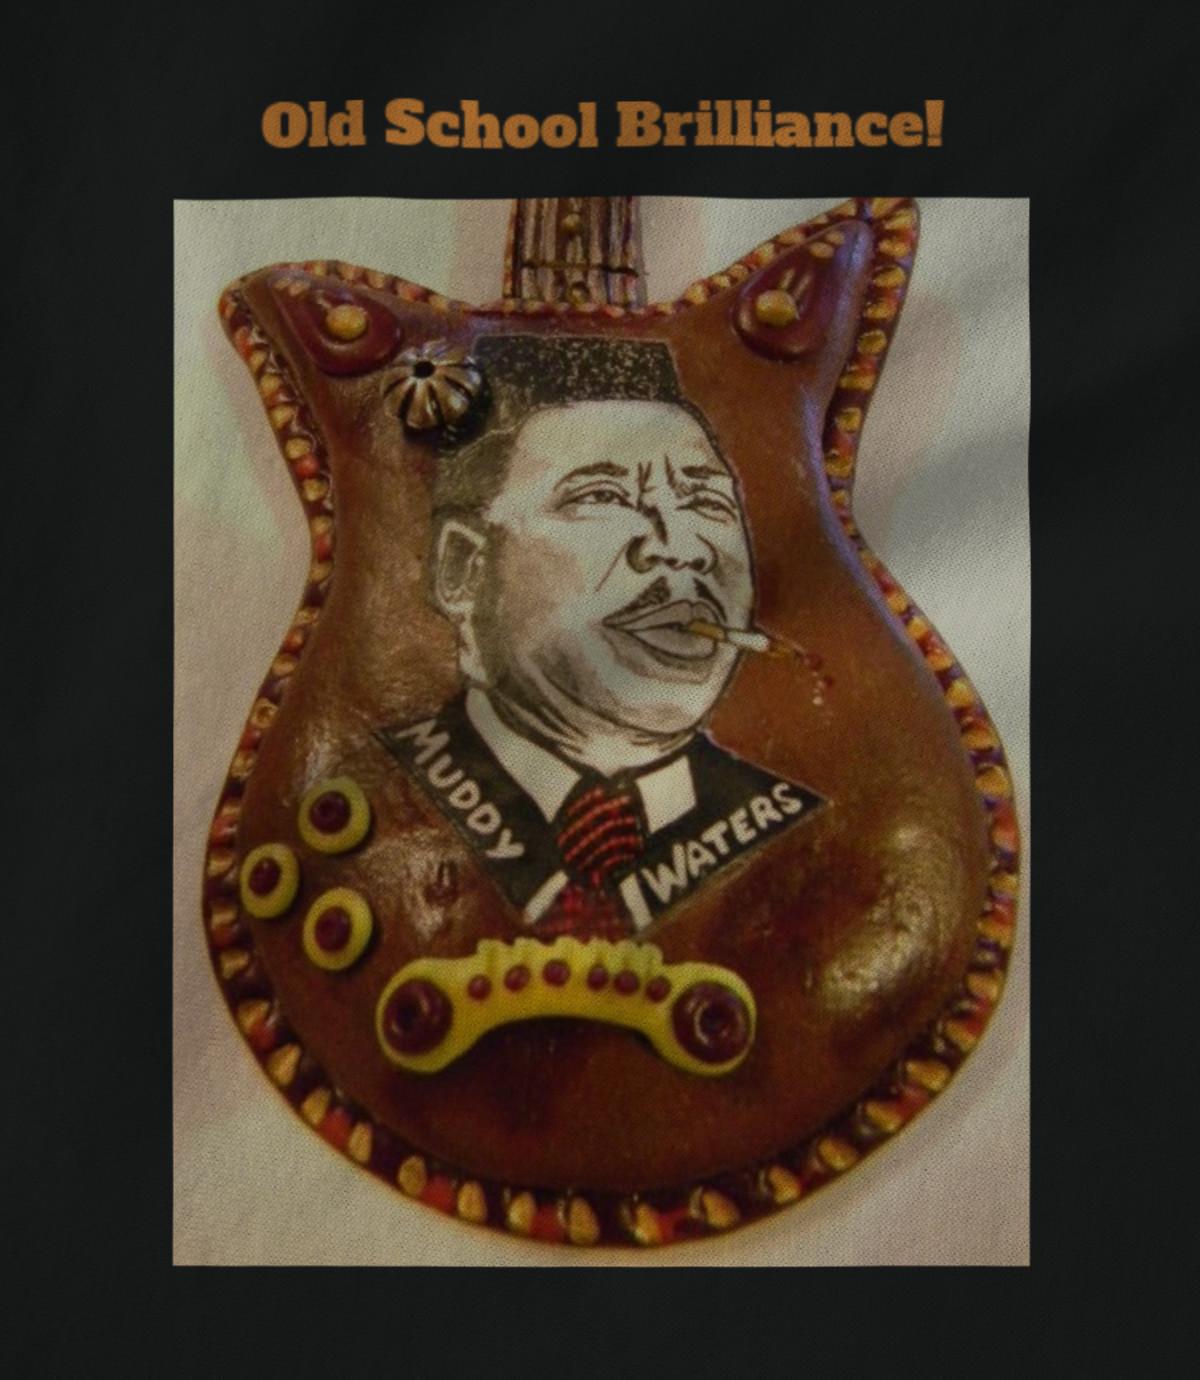 Matthew f  blowers iii olds school brilliance   1505343349